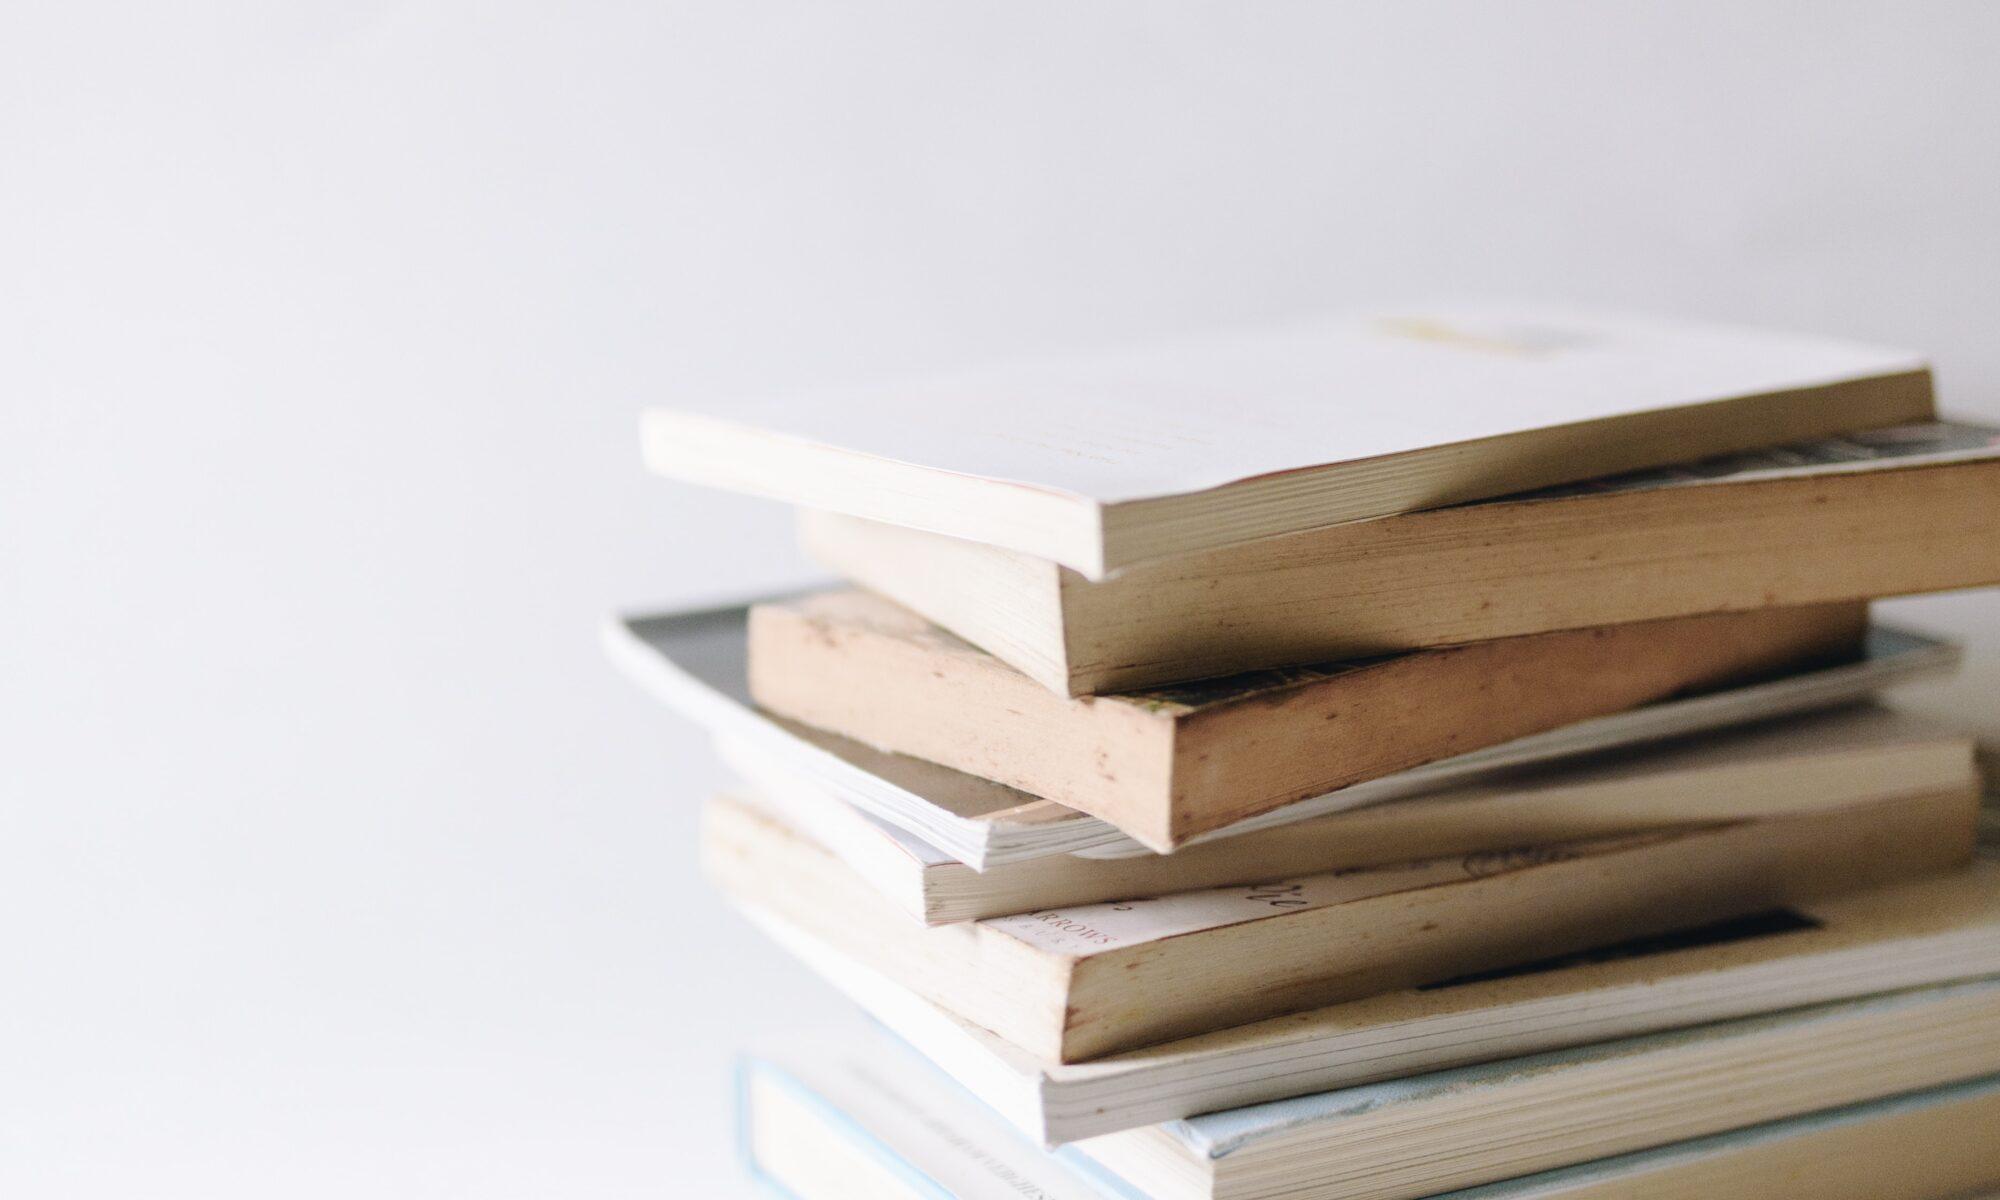 Books - Books Photo by Pratiksha Mohanty on Unsplash